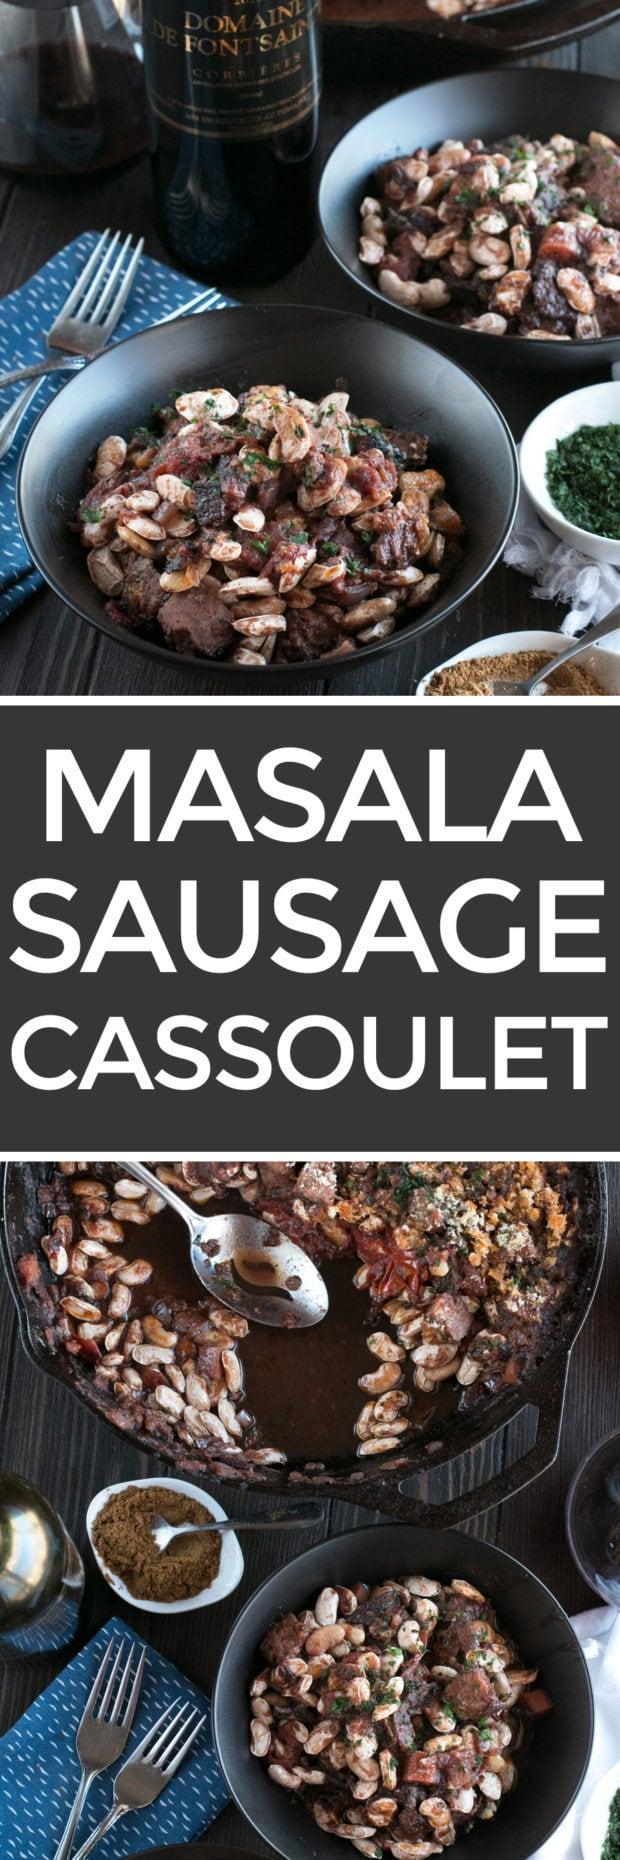 Masala Sausage Cassoulet